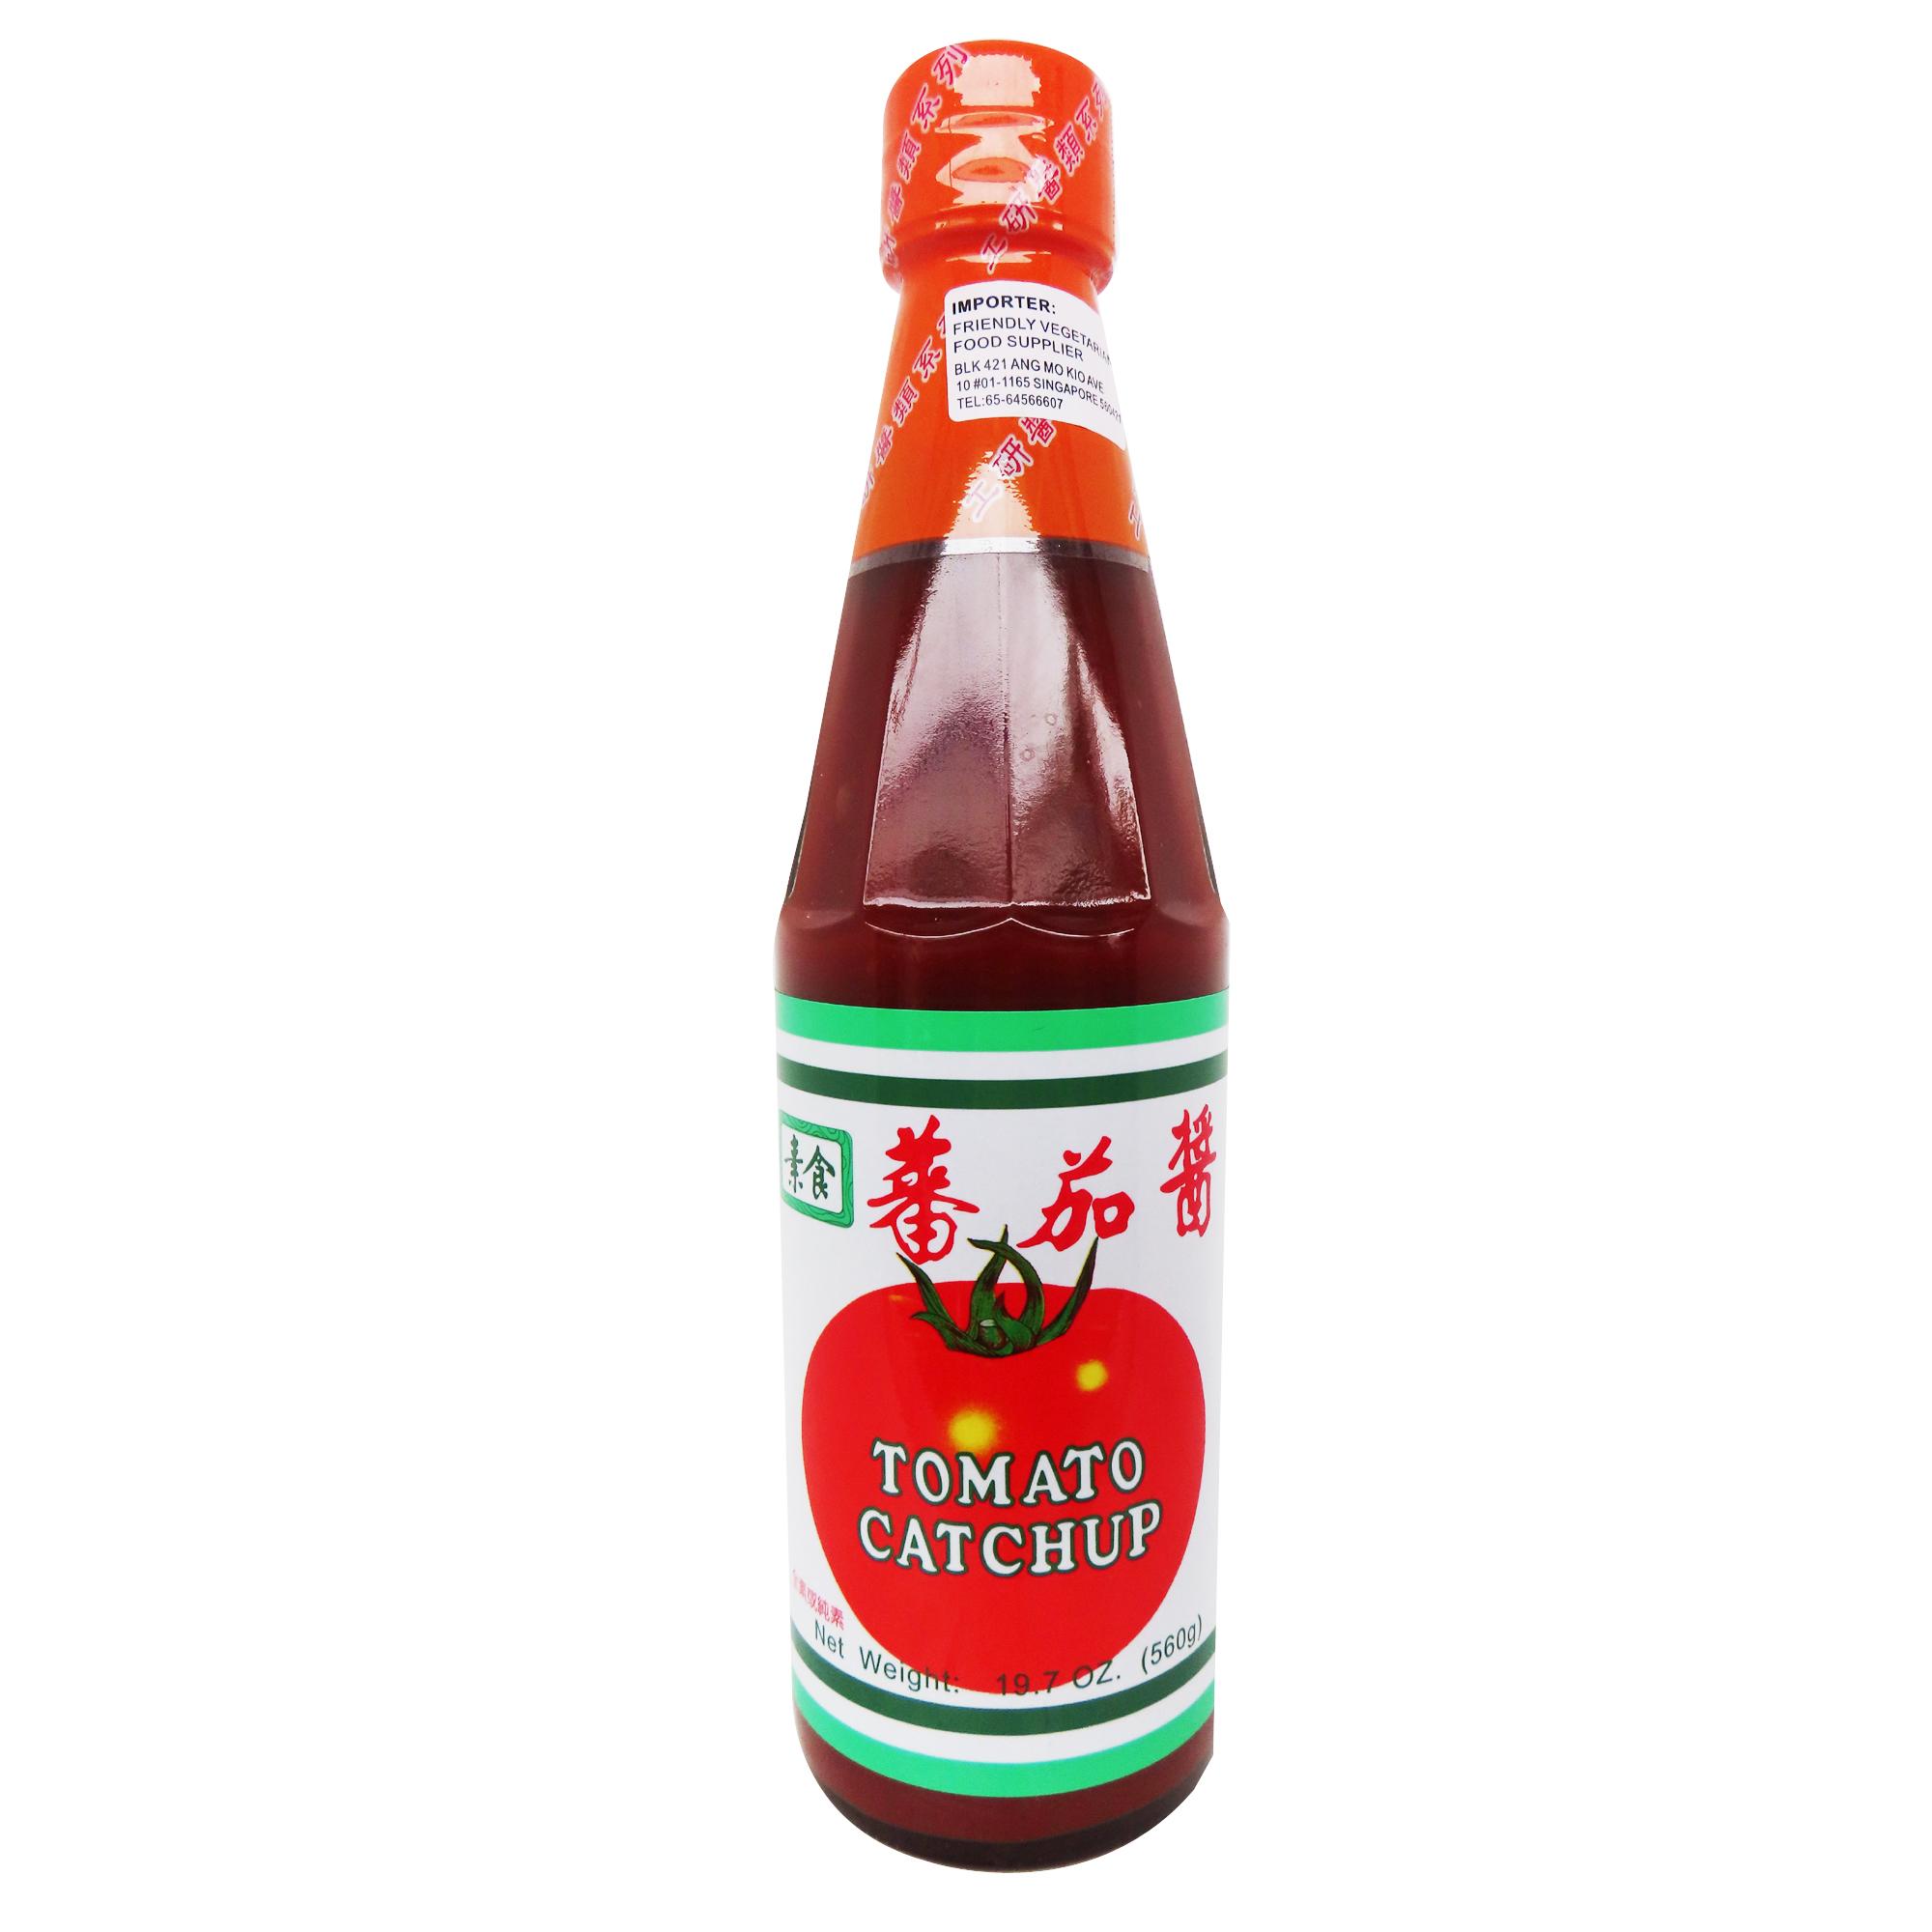 Image Tomato Catchup Ketchup 工研 - 番茄酱(大) 560grams